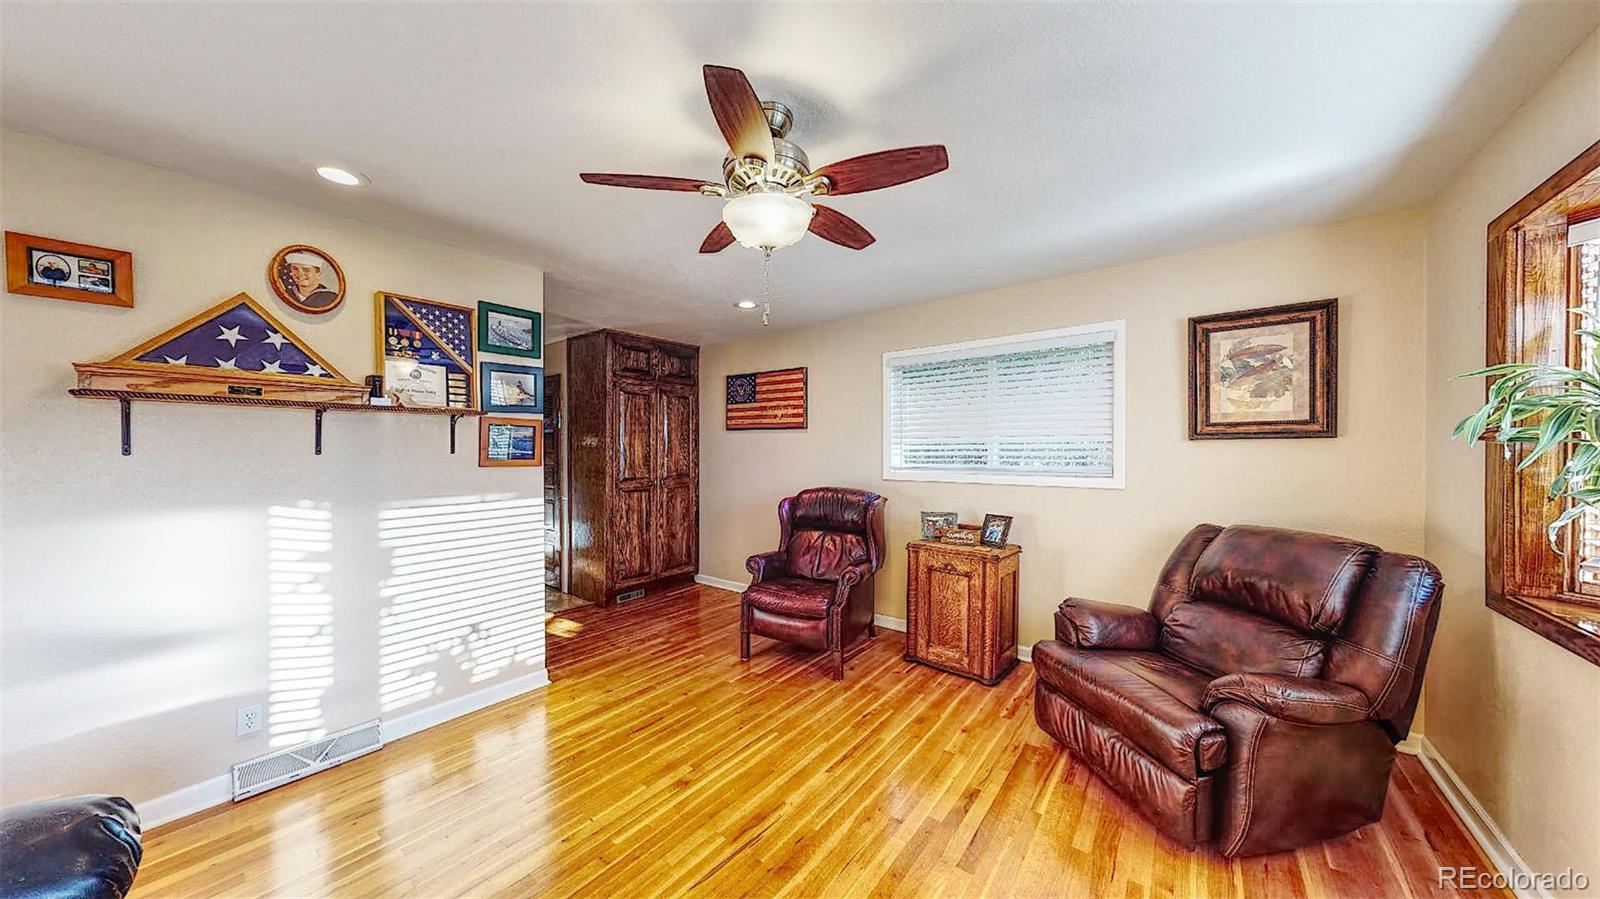 MLS# 6167151 - 7 - 1760 S Upham Street, Lakewood, CO 80232